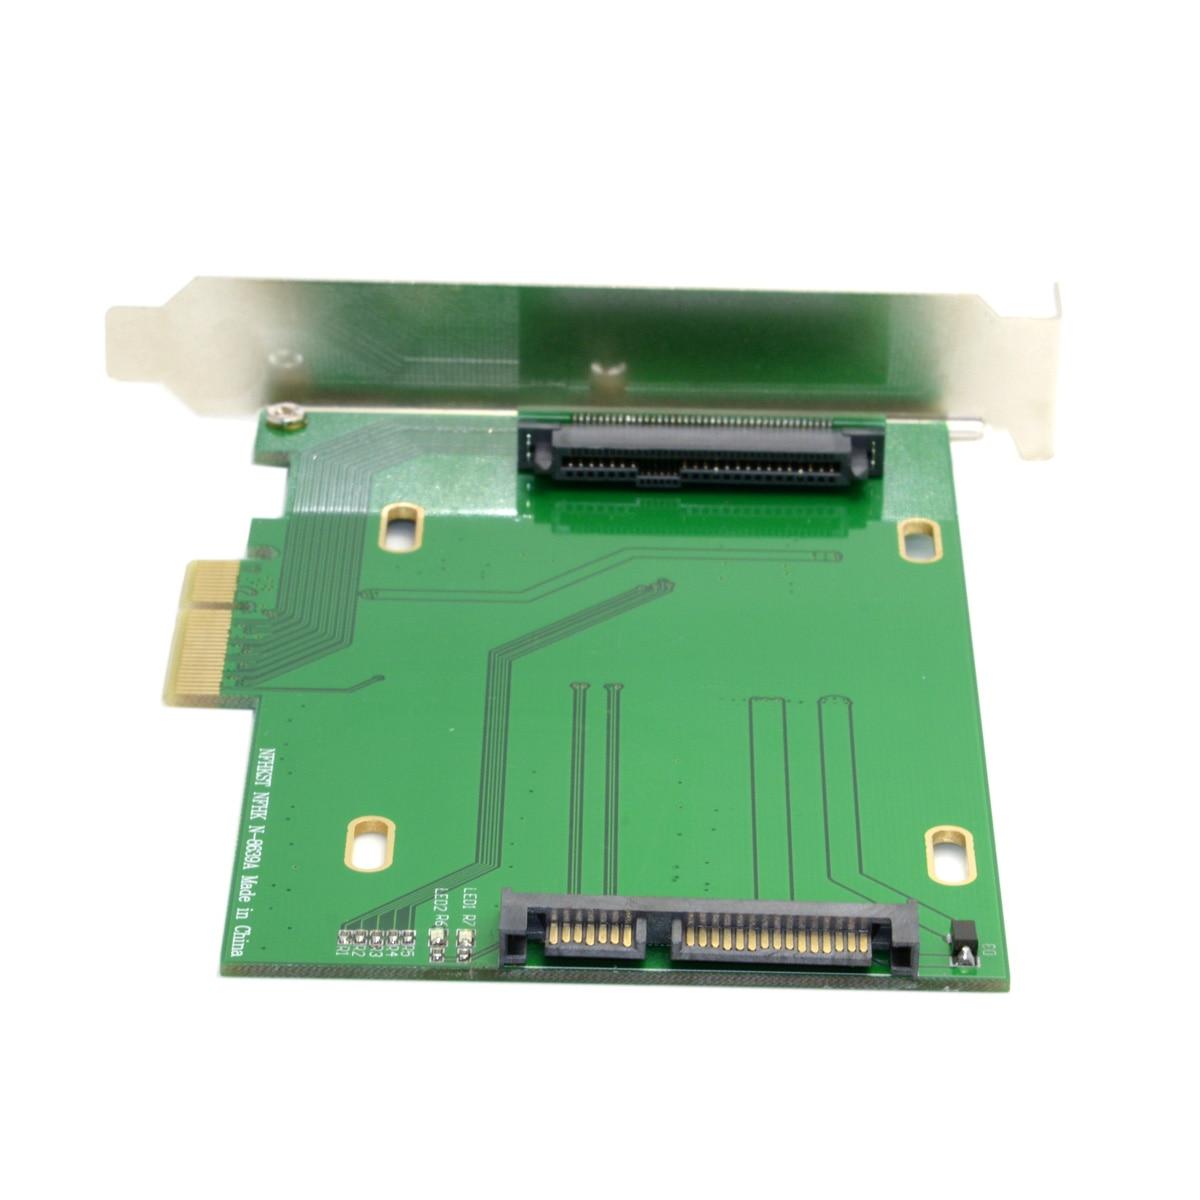 AliExpress - Xiwai PCI-E 3.0 x4 Lane to U.2 U2 Kit SFF-8639 Host Adapter for Intel Motherboard & 750 NVMe PCIe SSD